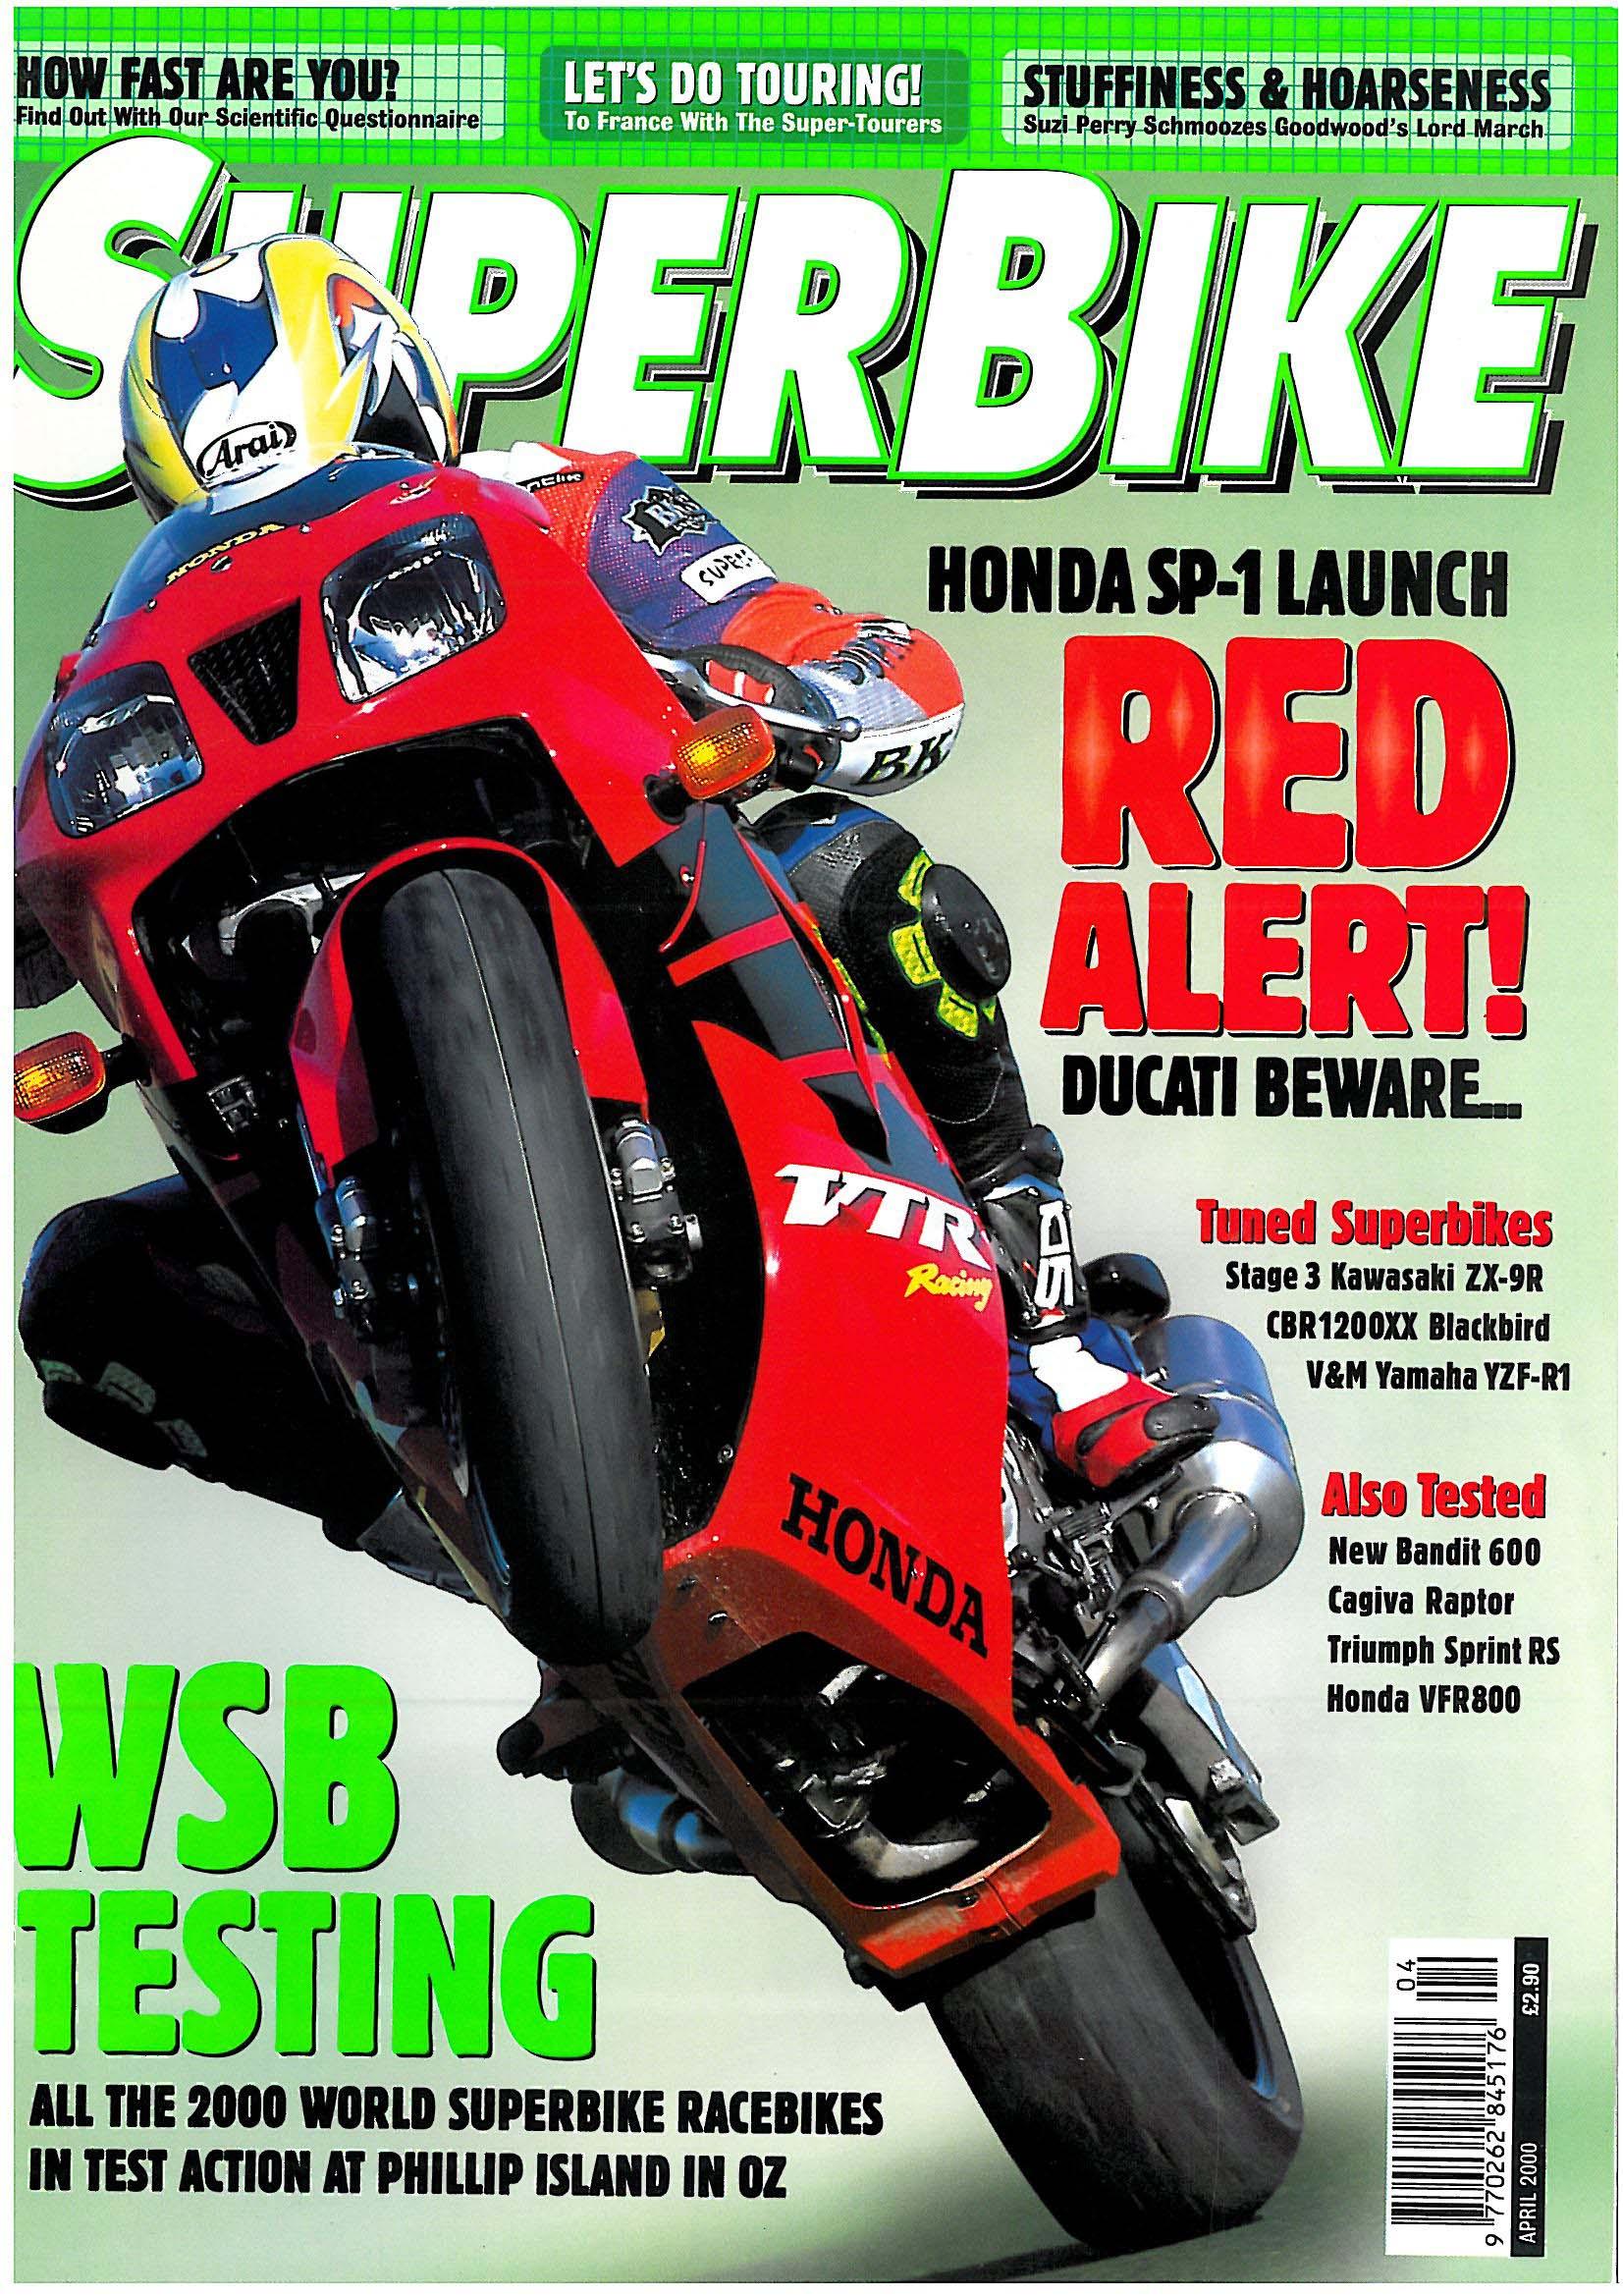 Honda vtr 1000 sp 1 superbike magazine for Time magazine subscription cancellation